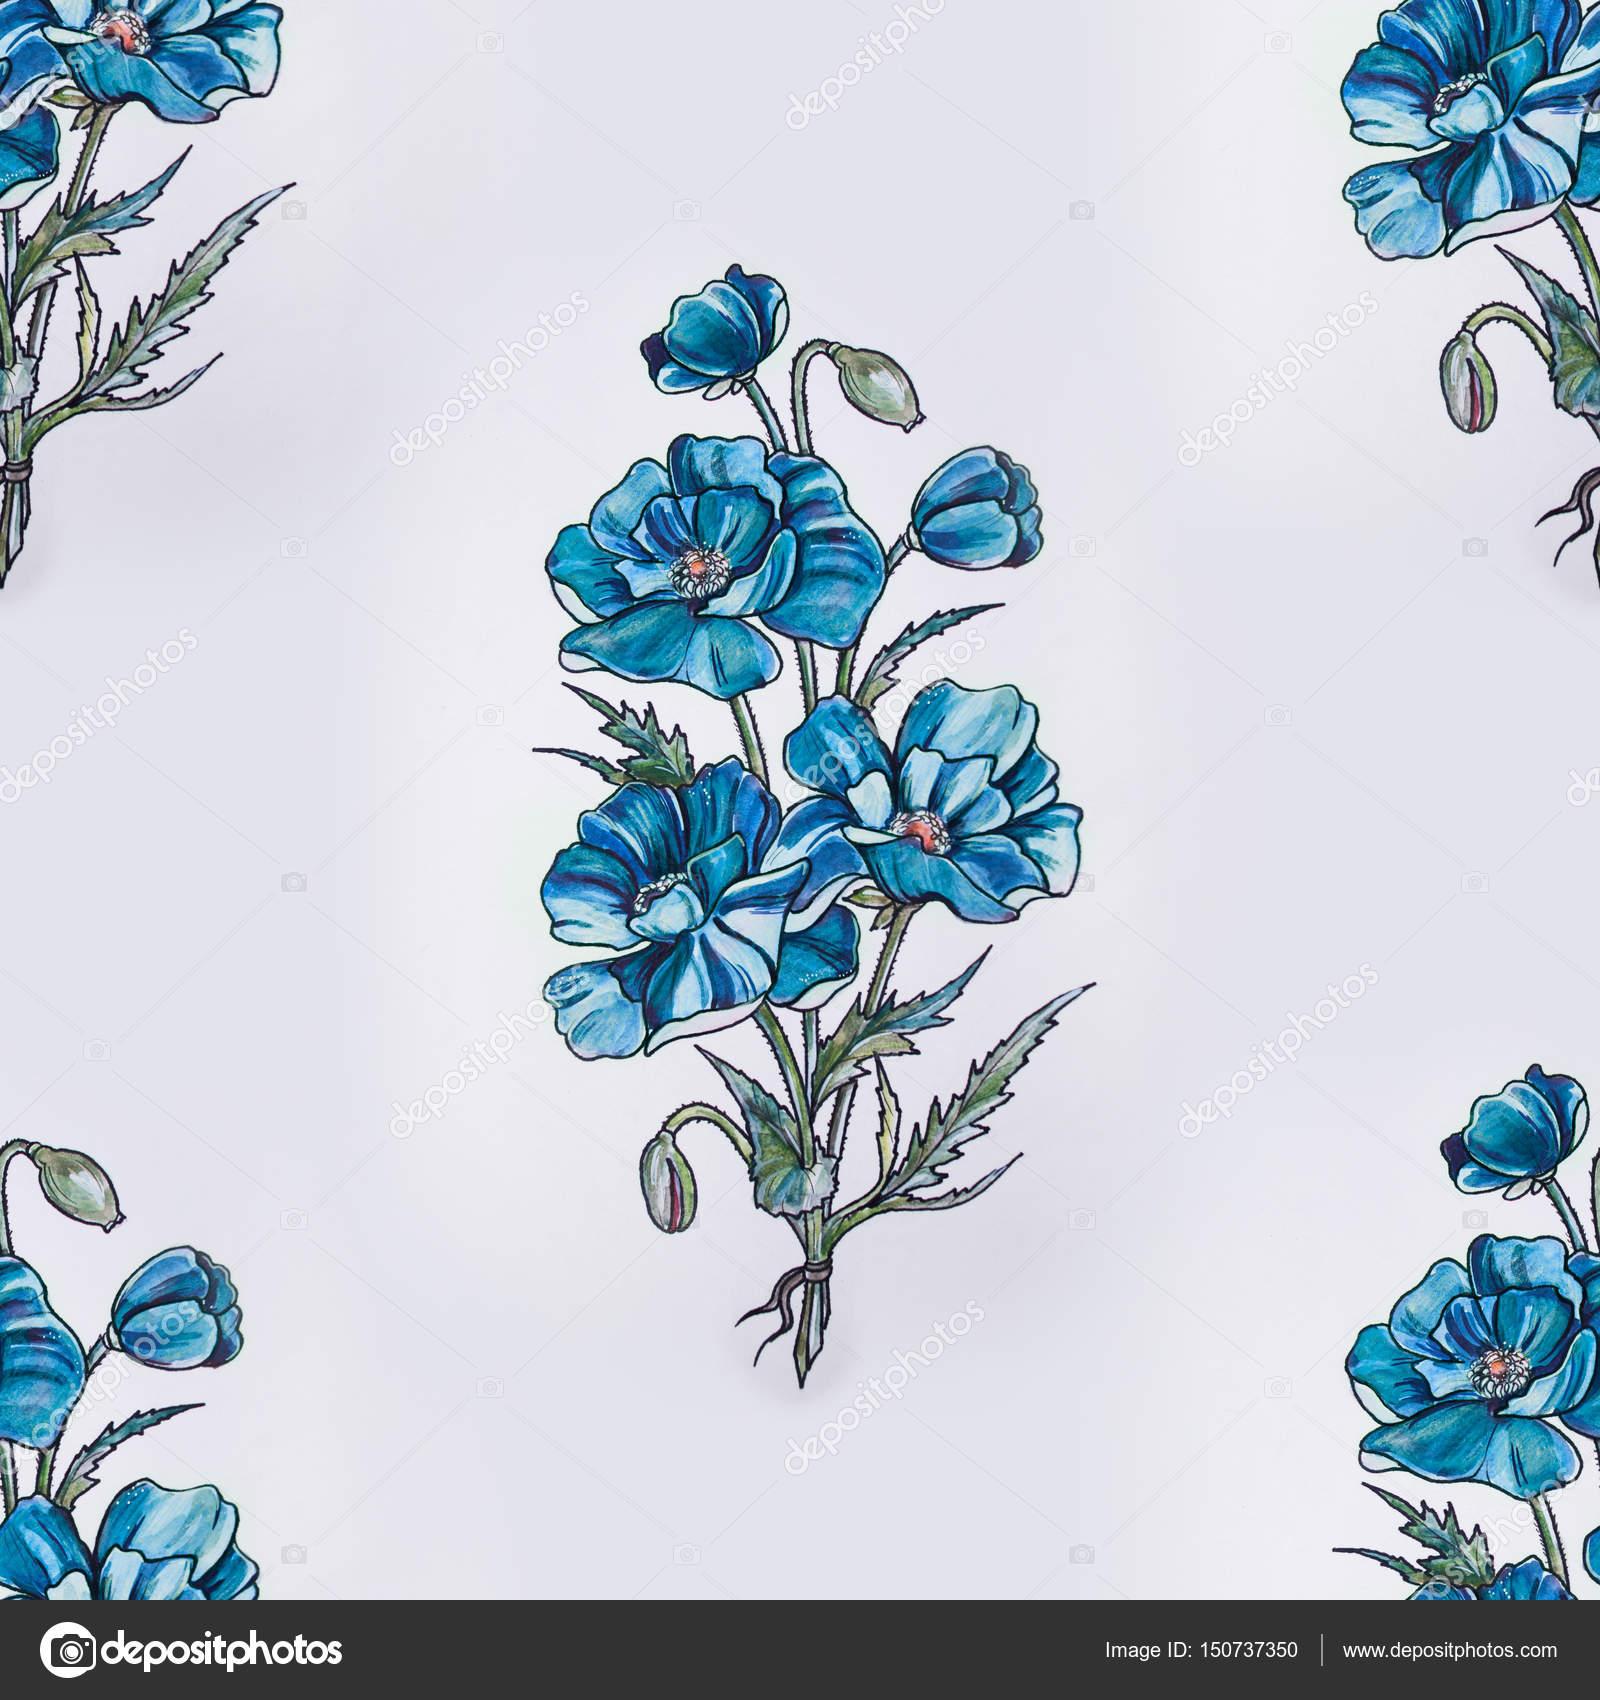 Patron Sin Fisuras De Hermosas Flores Azules Sobre Fondo Blanco